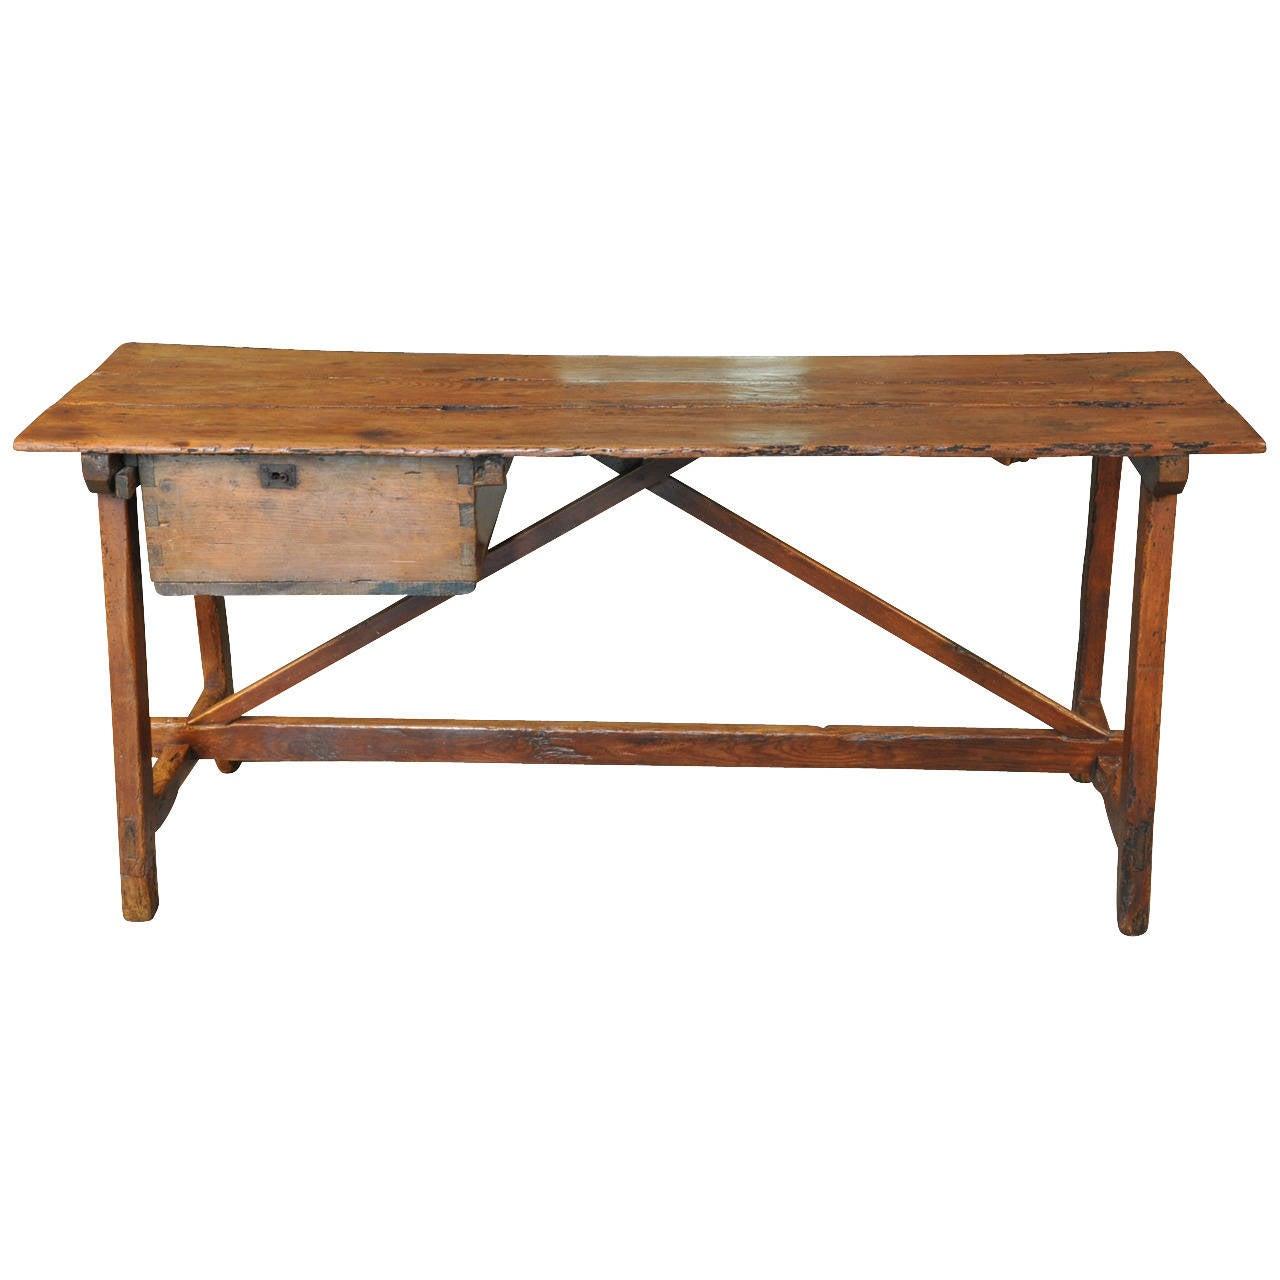 Mid 19th Century Primitive Spanish Work Table At 1stdibs